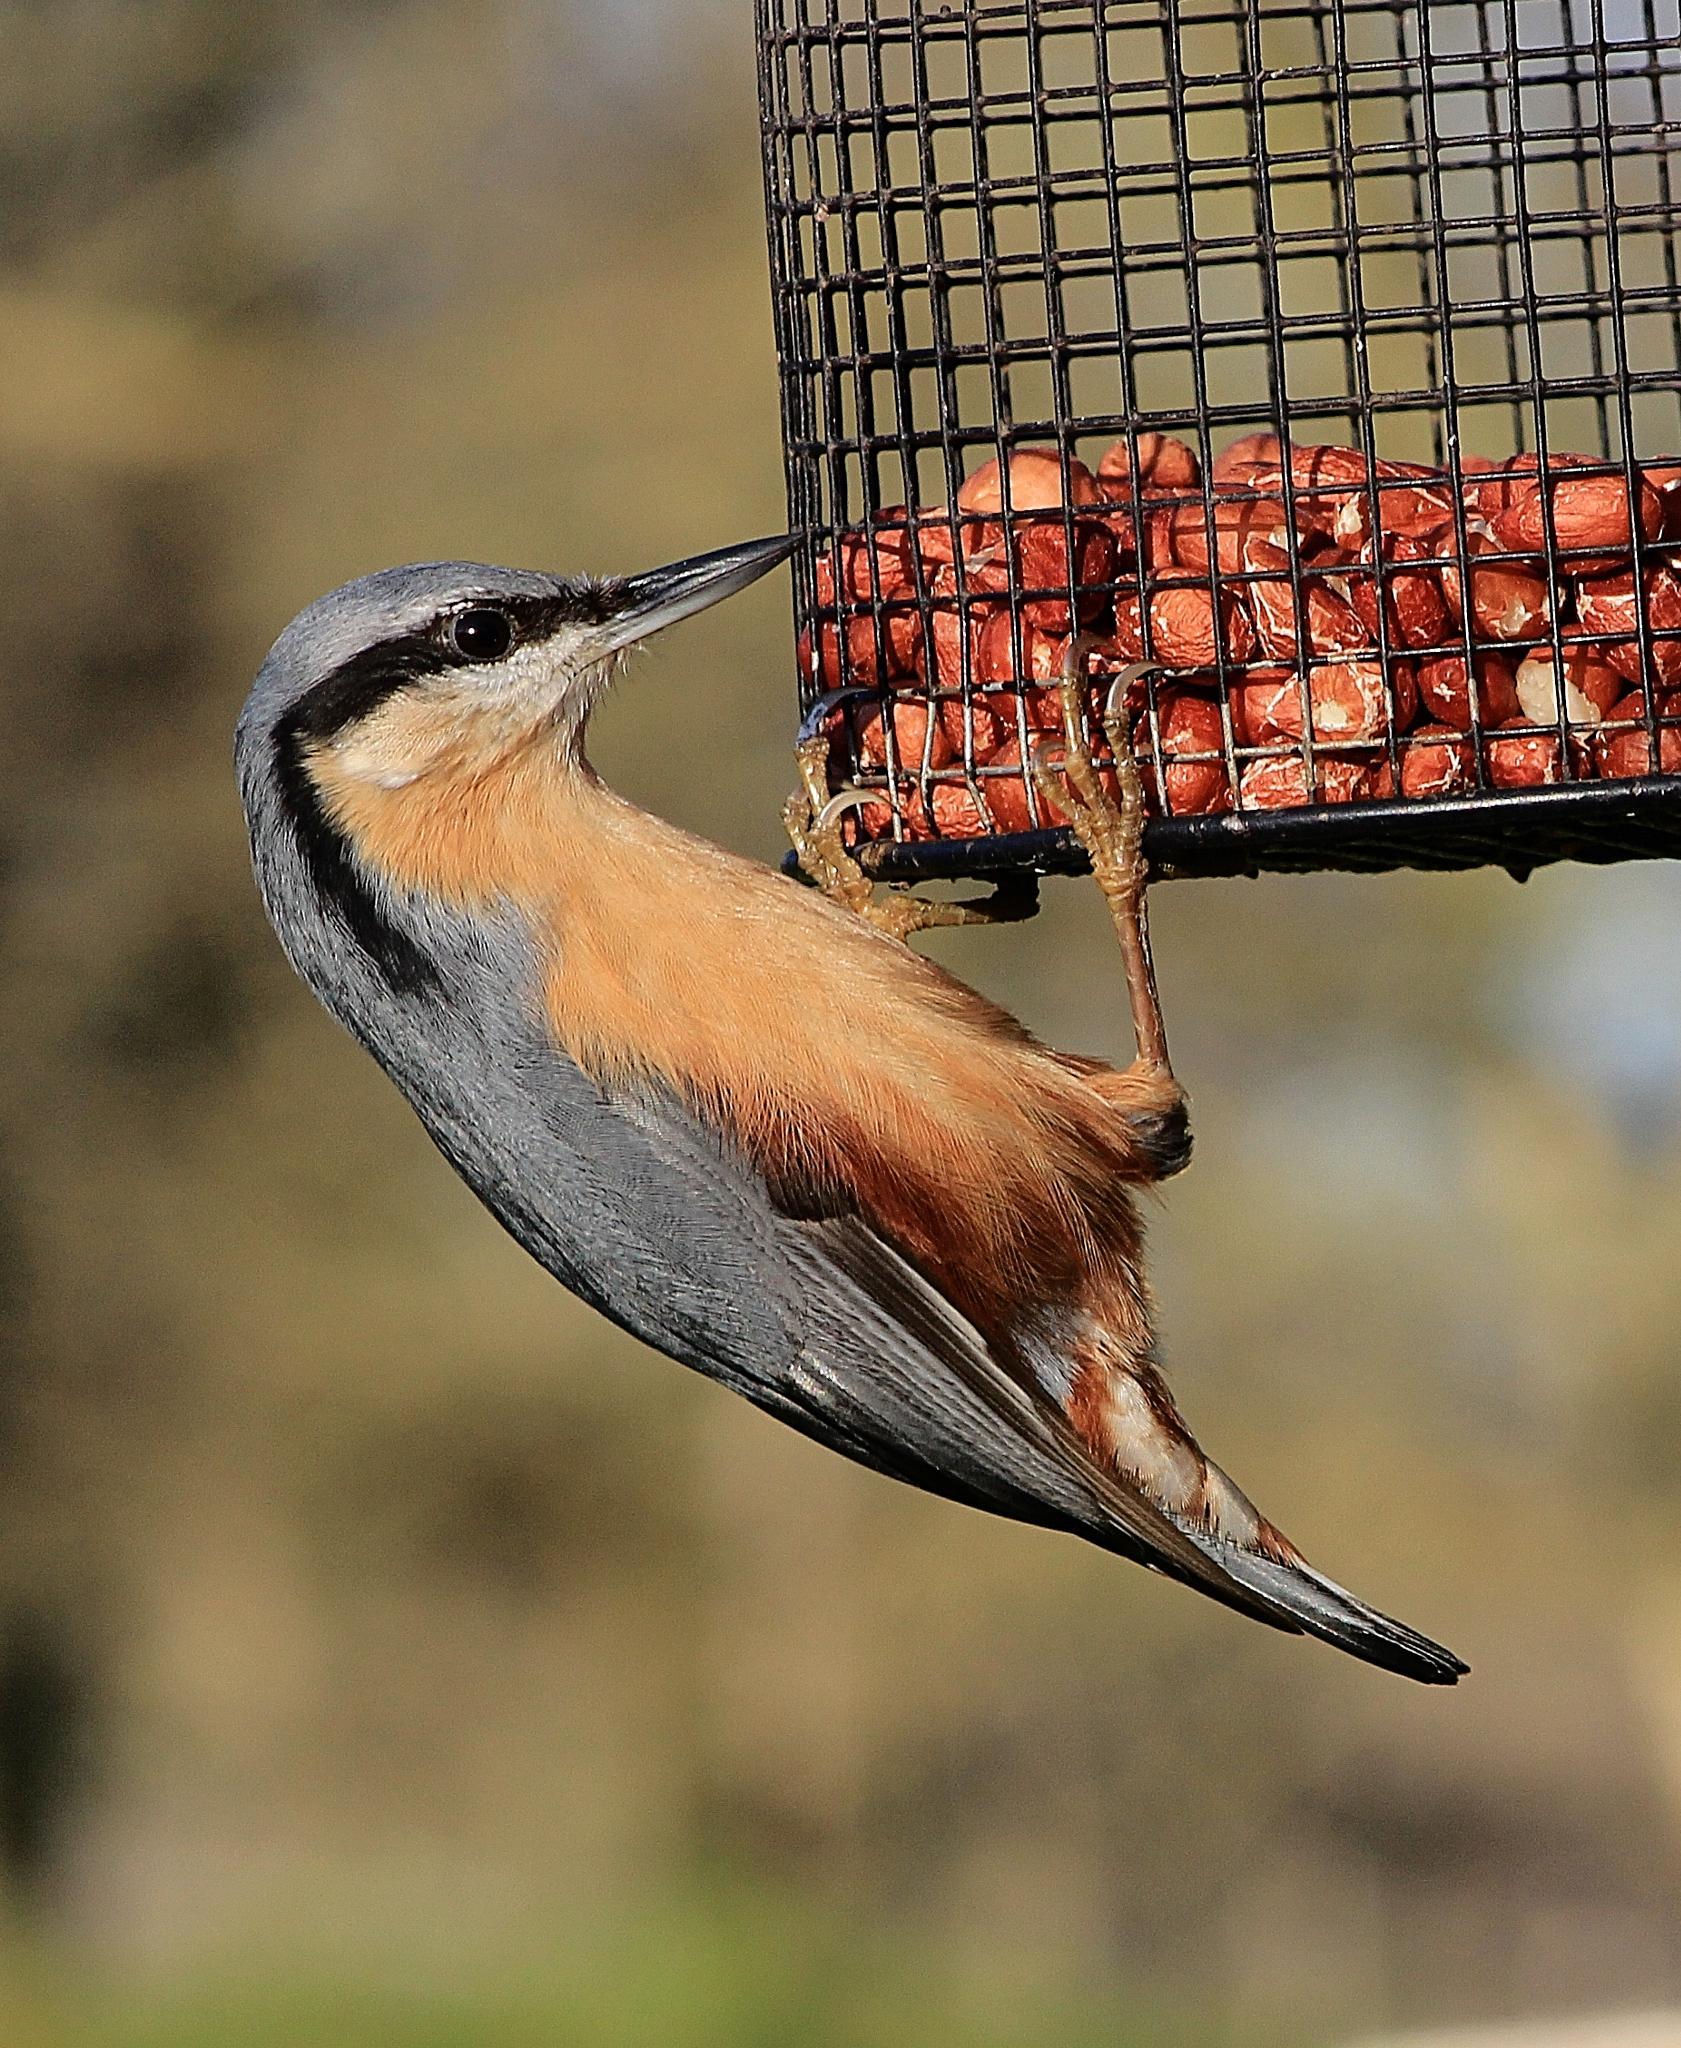 Nuthatch on feeder by Andrew Wildman